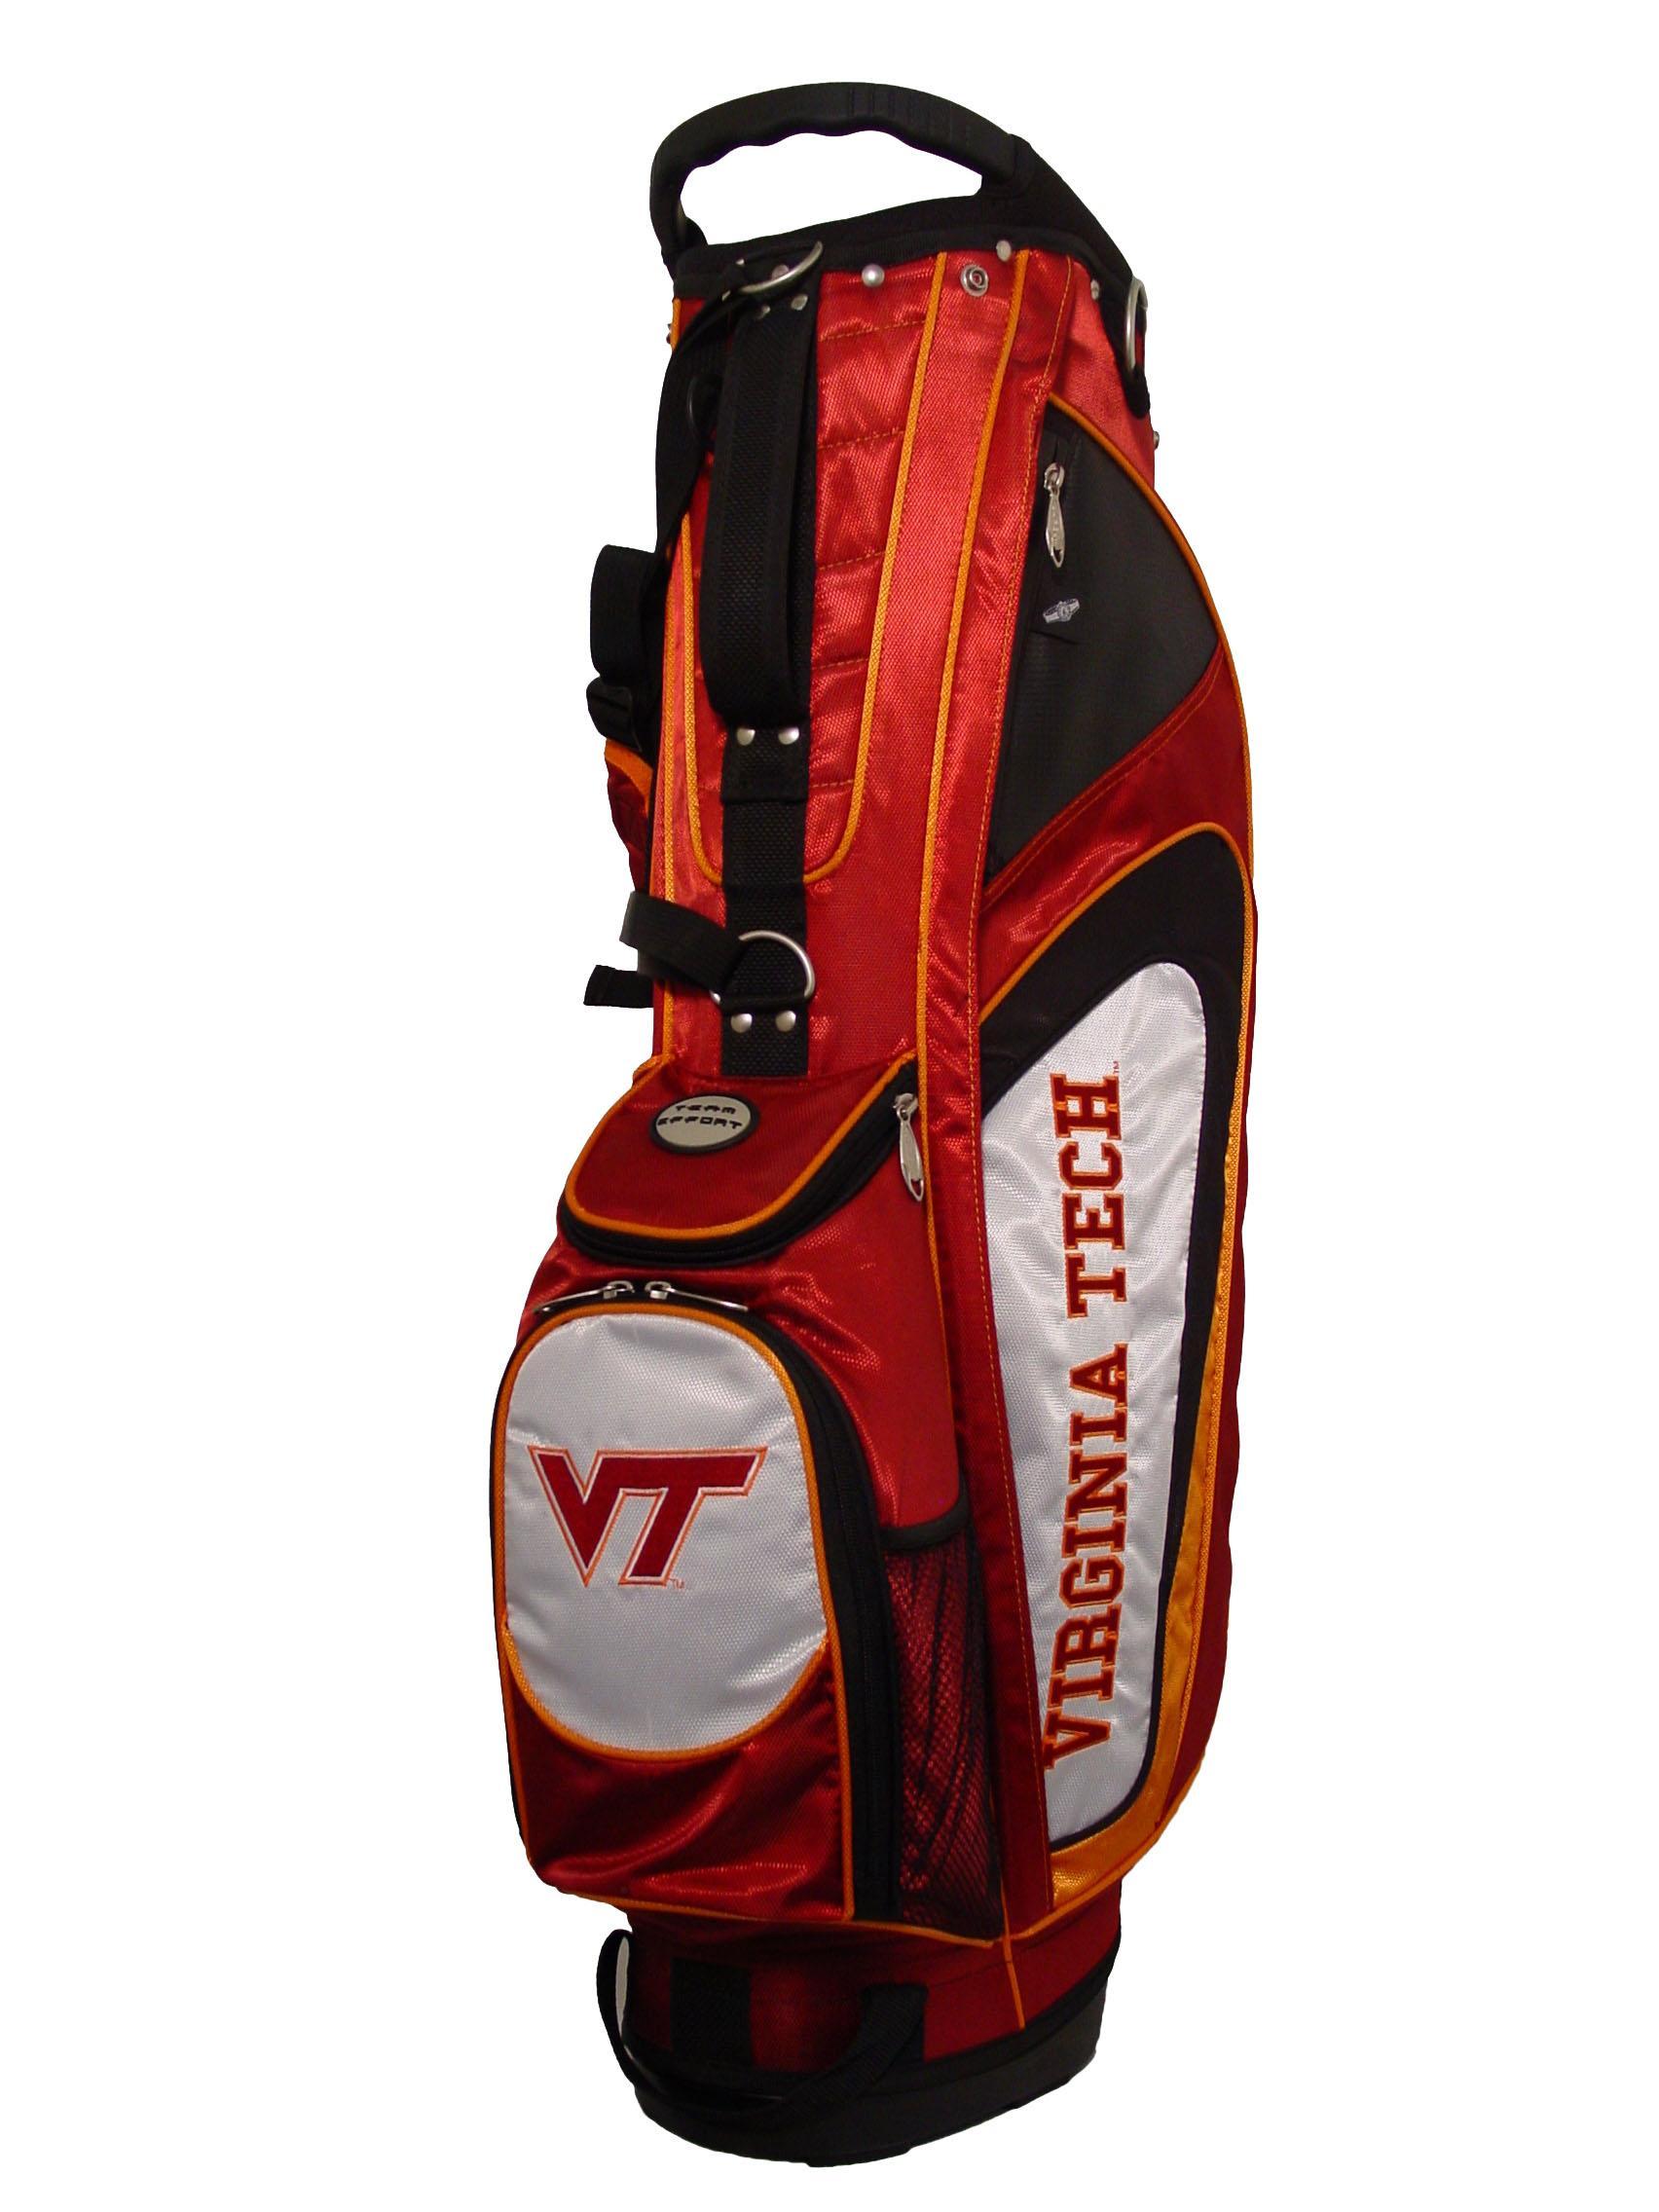 bf58a6e2c27881 Virginia Tech Hokies Gridiron College Golf Stand Bag